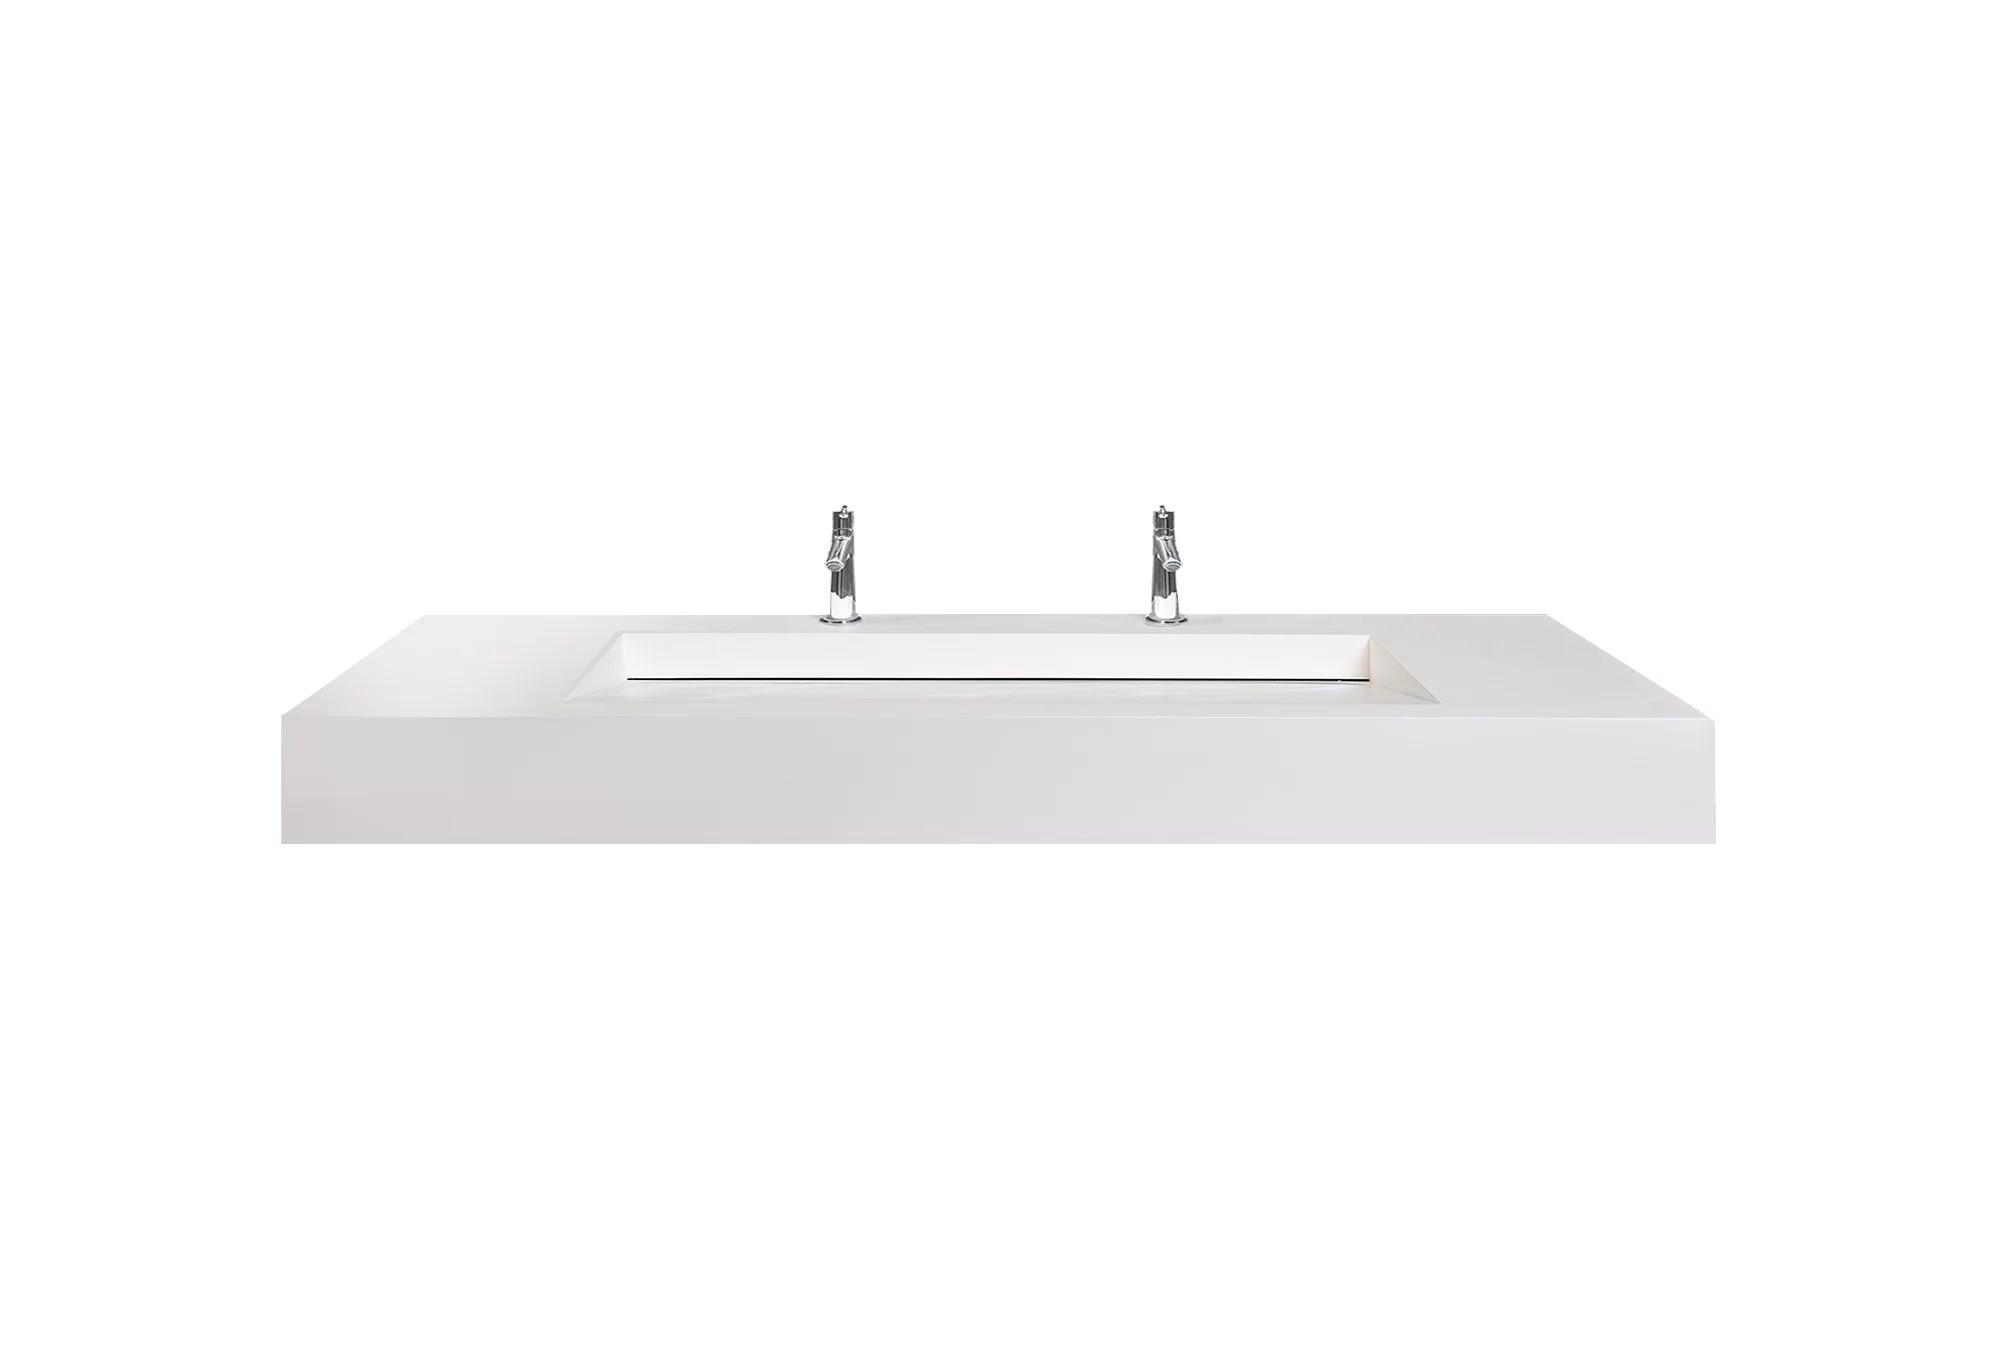 castellousa audrey 72 single bathroom vanity top wayfair